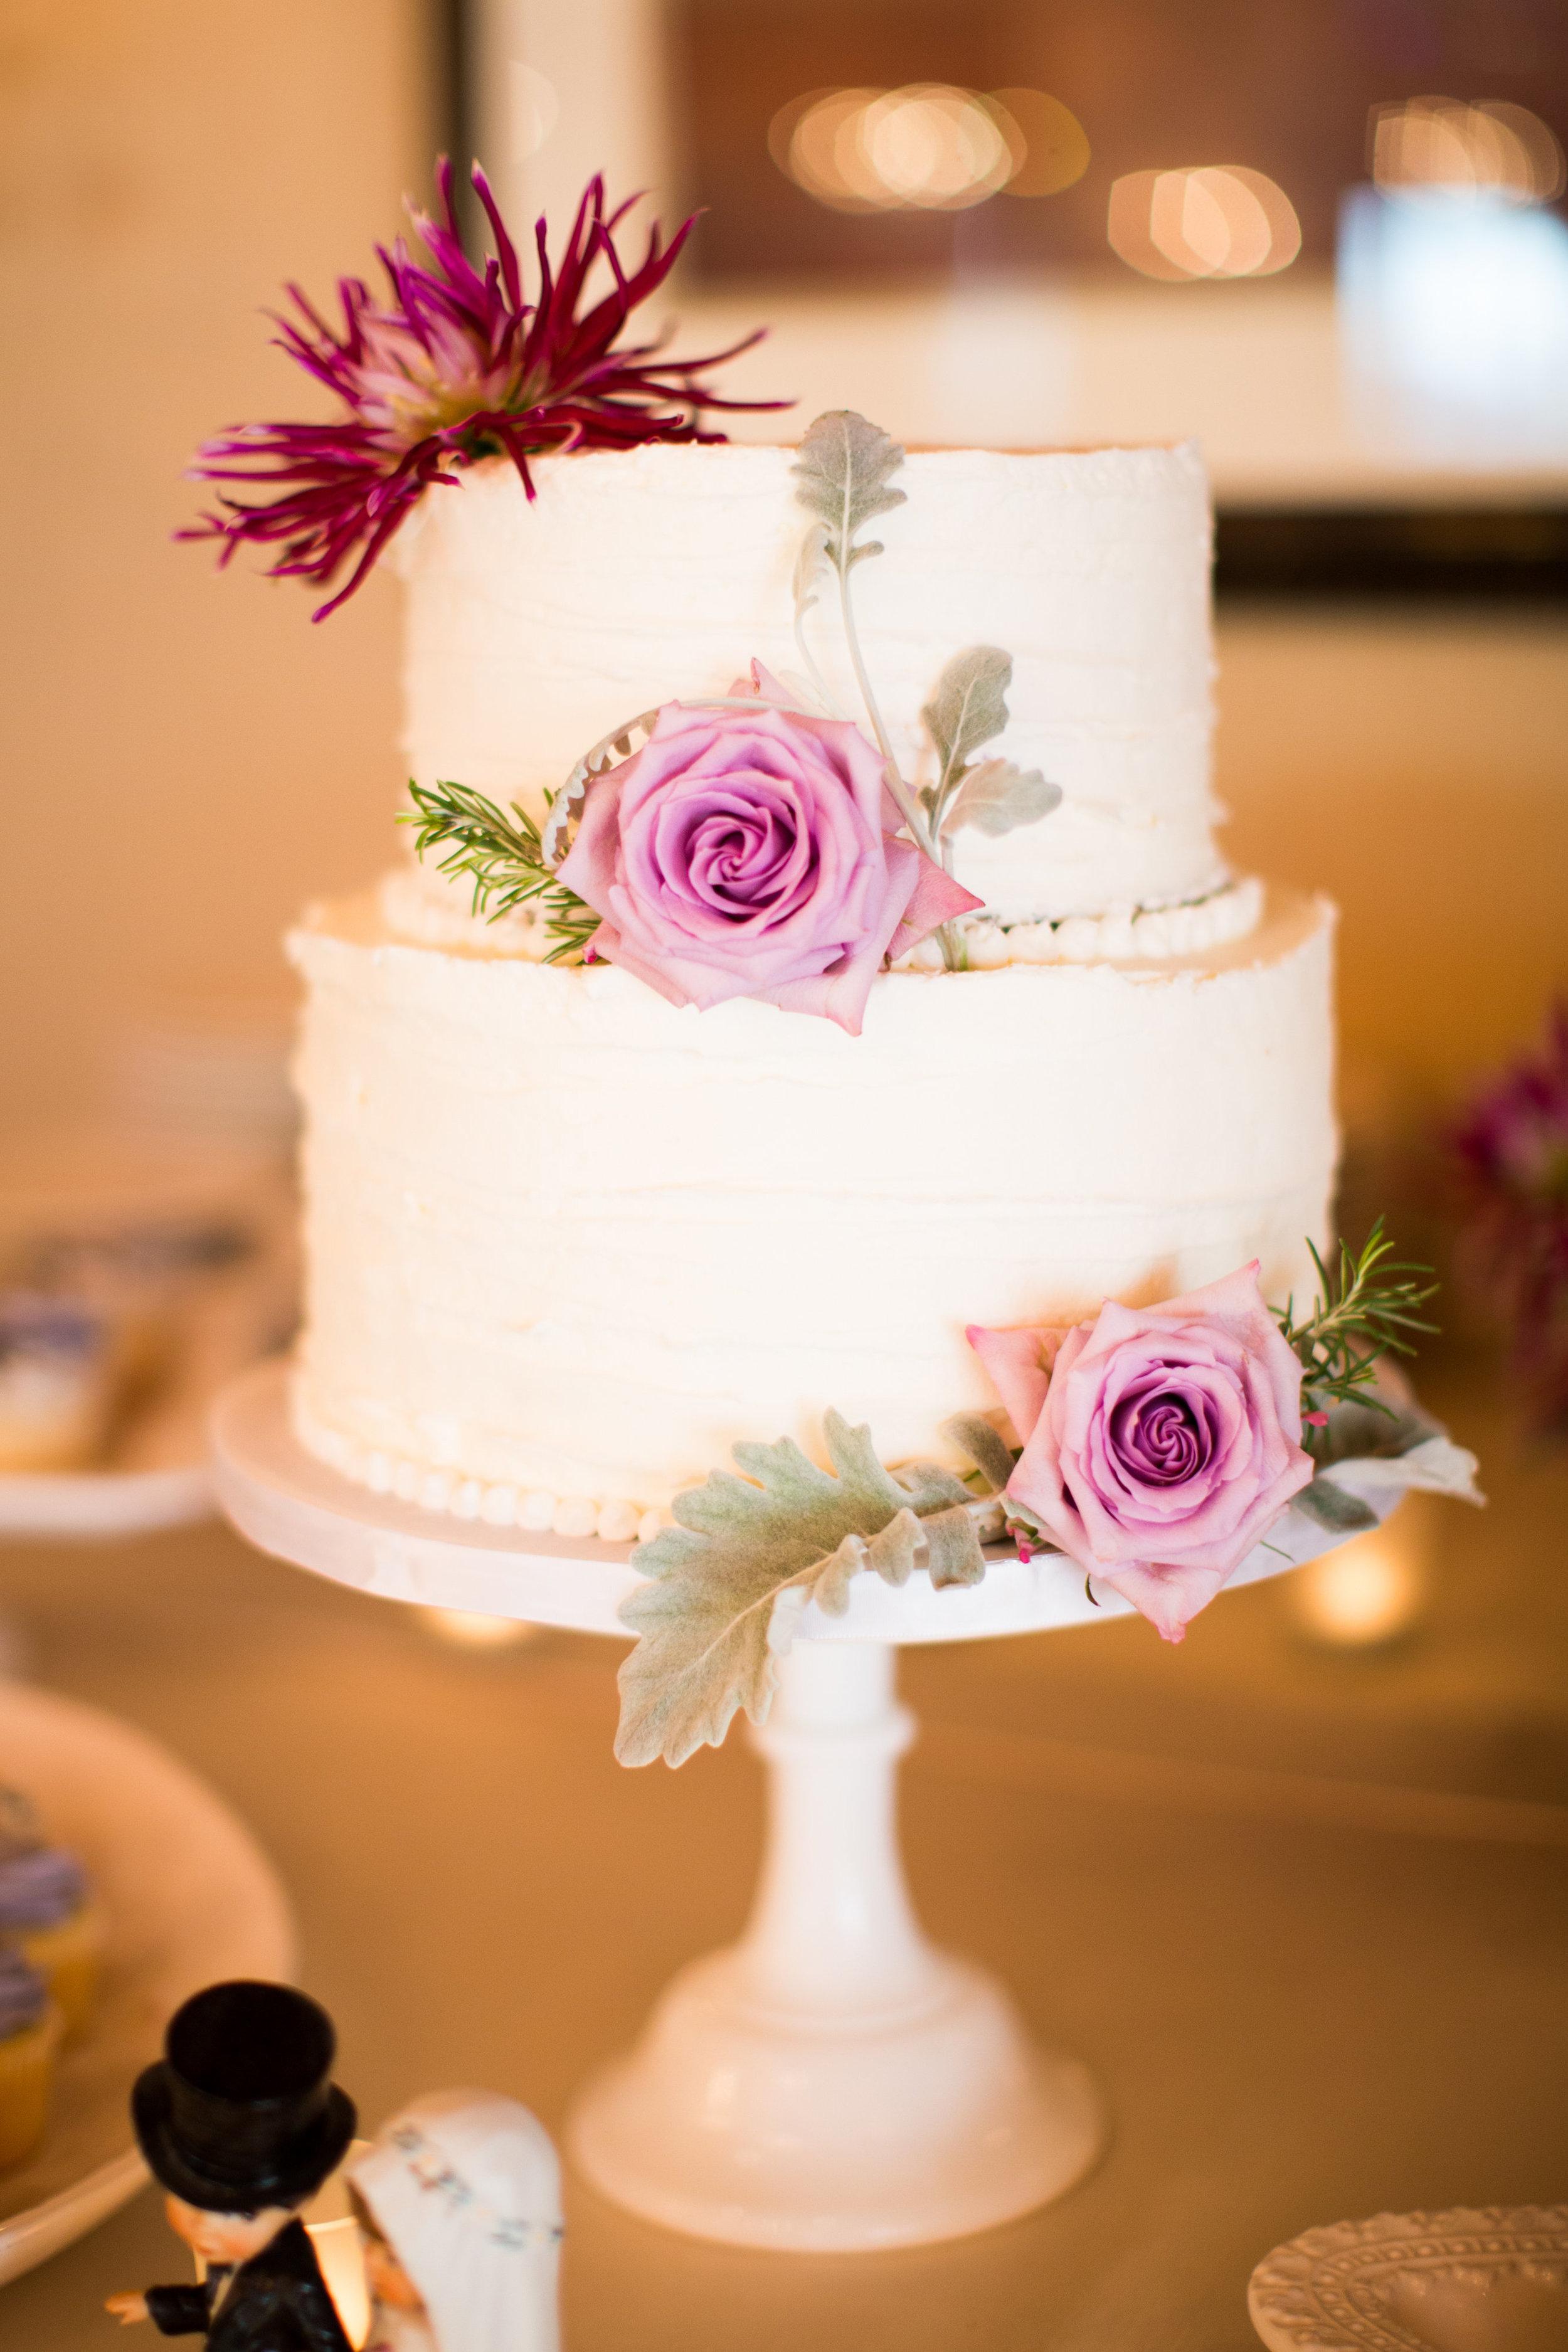 Seattle Wedding Planner, Wedding Wise | Ciccarelli Photography | Edgewater Hotel Wedding | Buttercream Cake with Purple Flowers